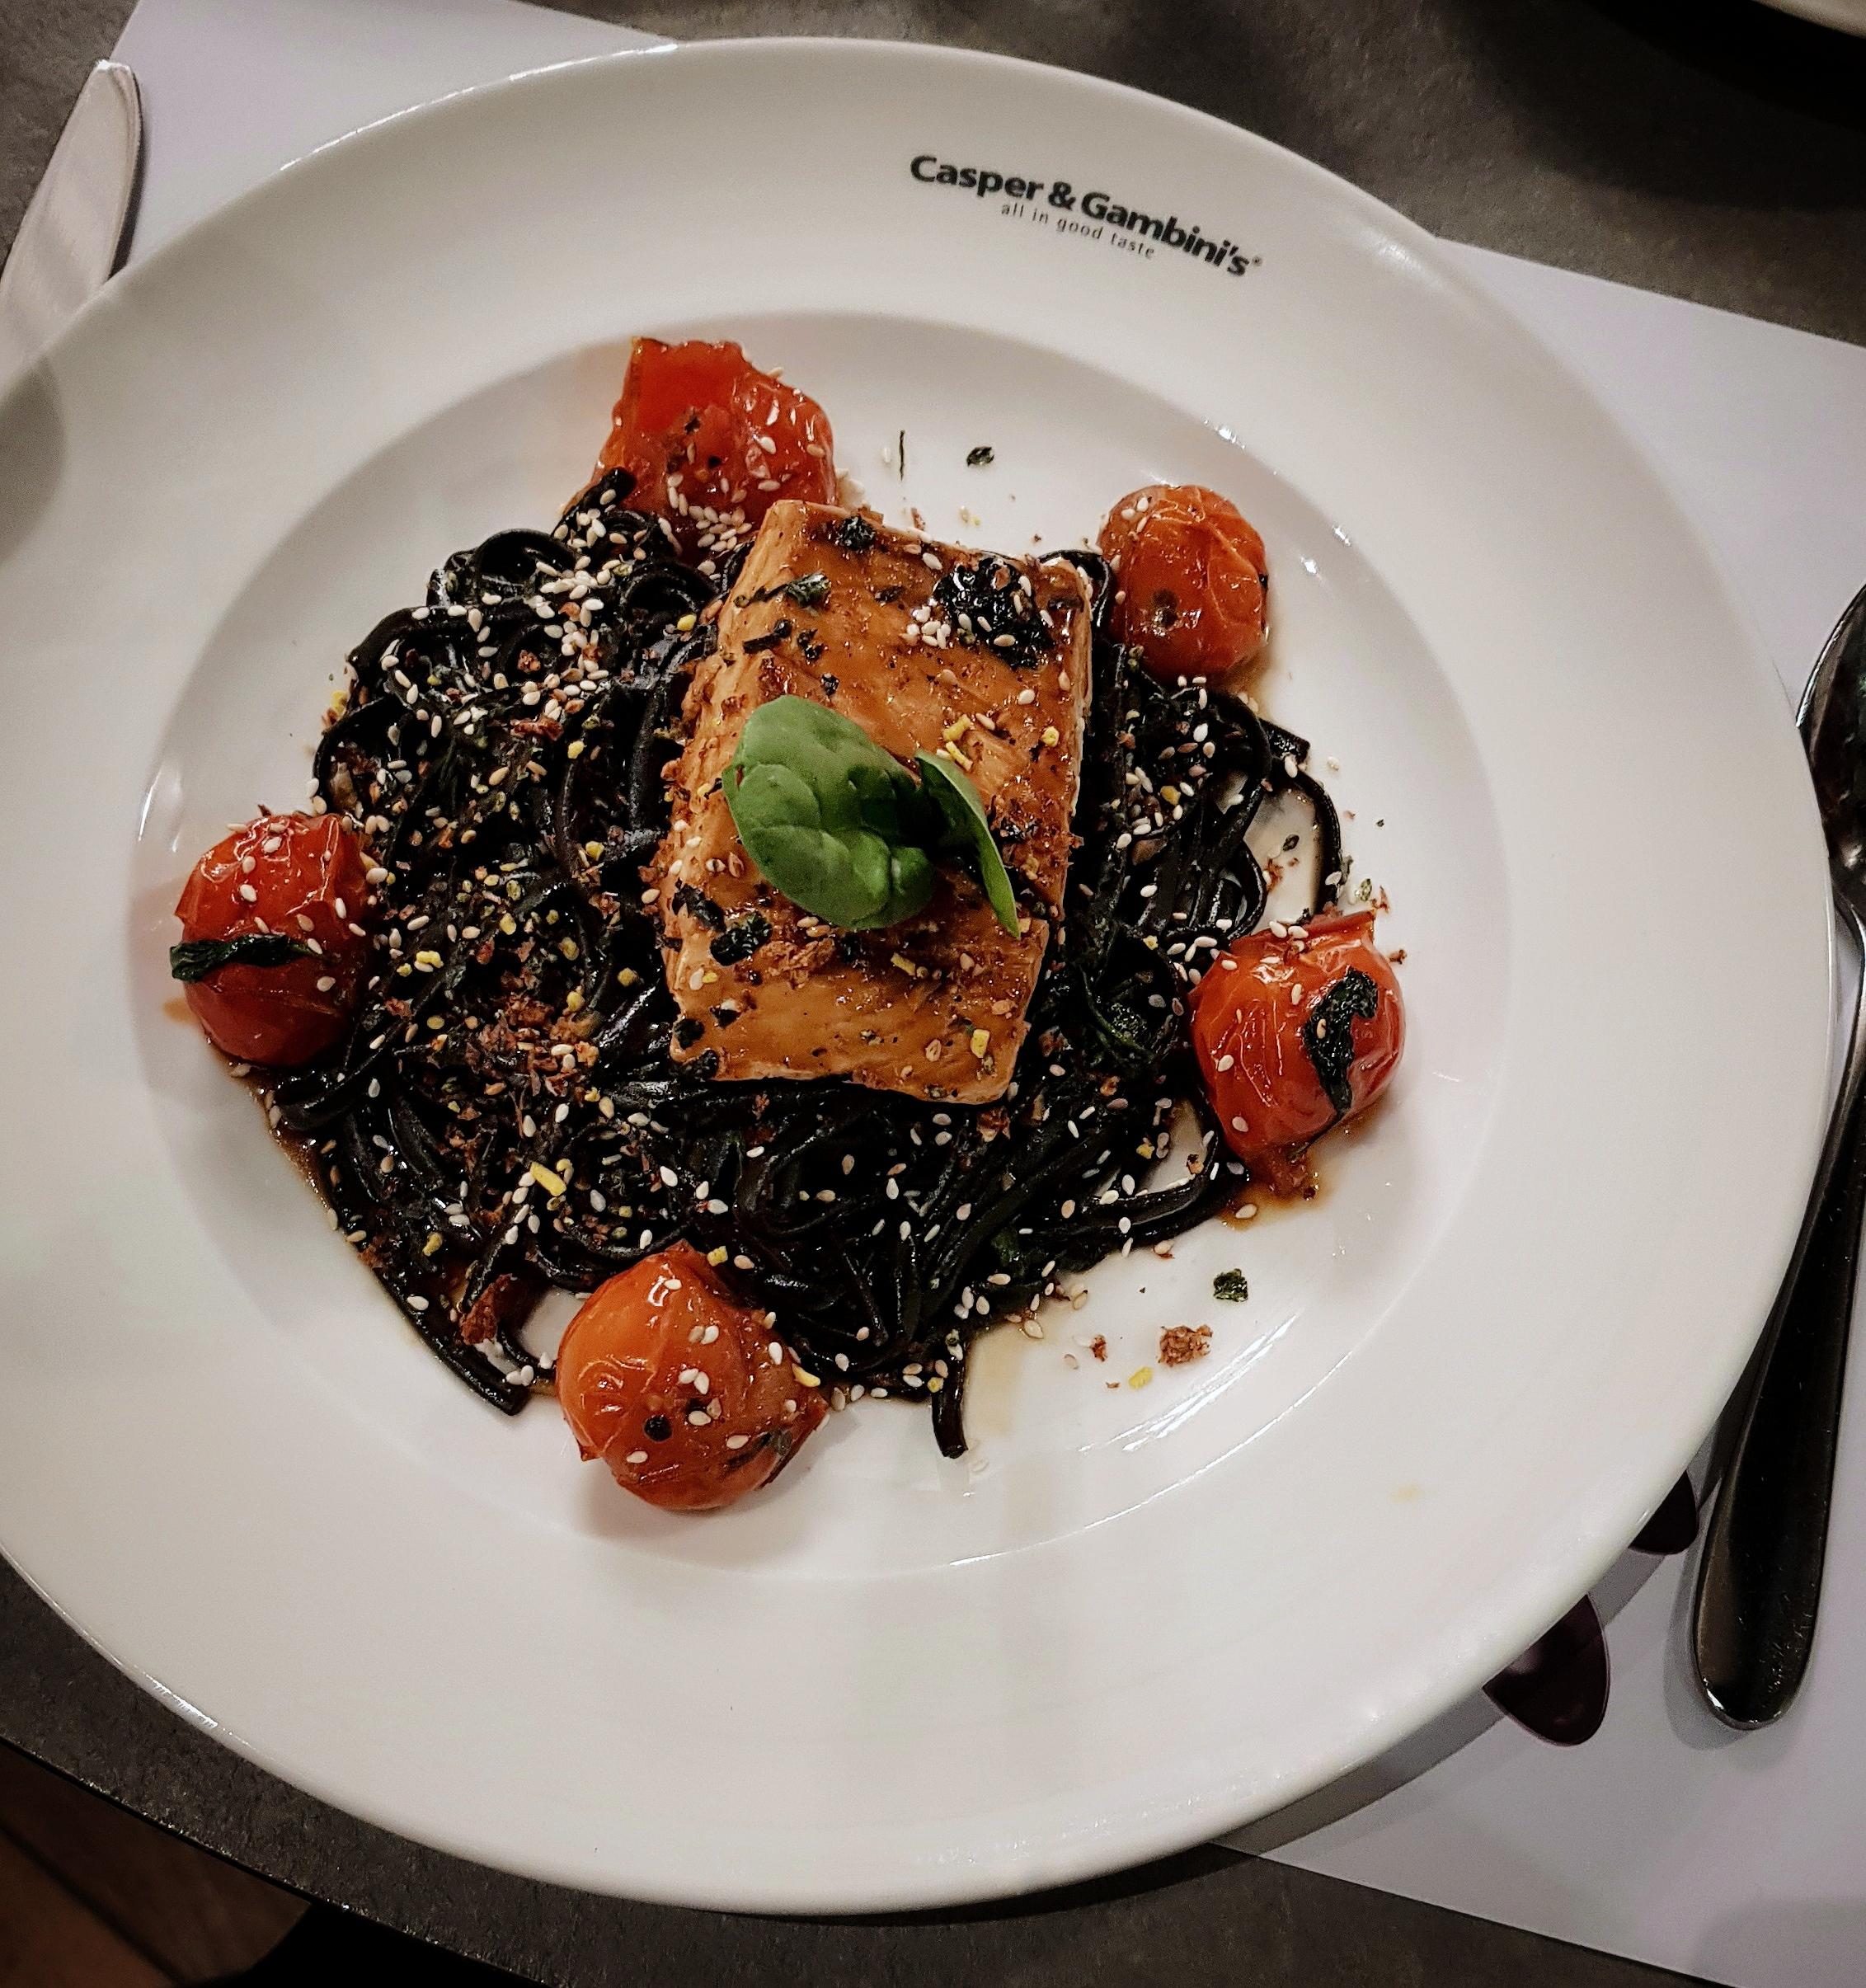 casper-gambini-mirqab-mall-creativitywithkay-fresh-salmon-black-inked-pasta.jpg